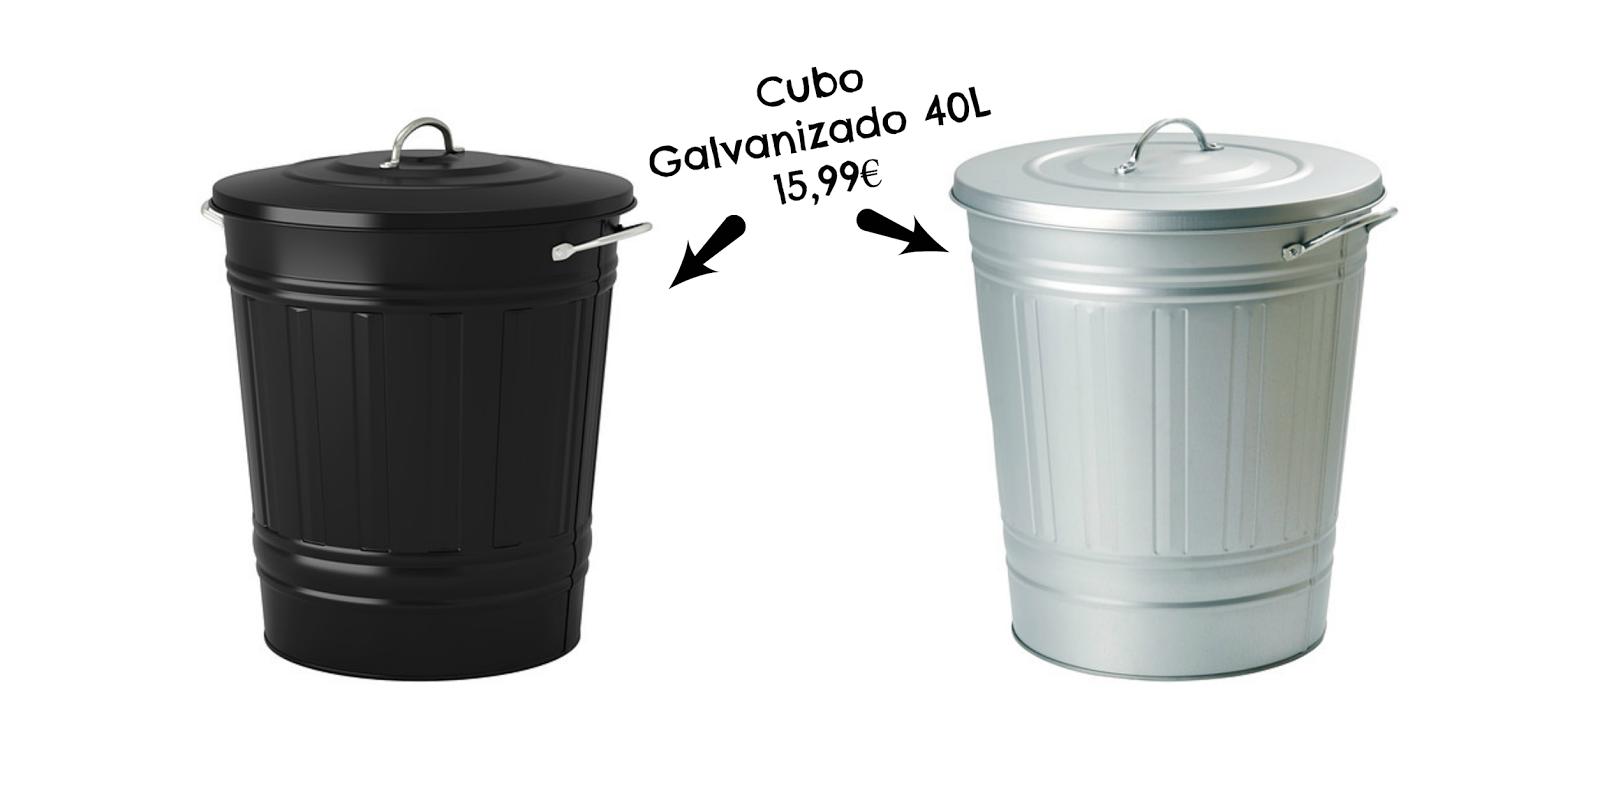 Pitis and lilus diy customizando un cubo de basura - Cubo metalico ikea ...